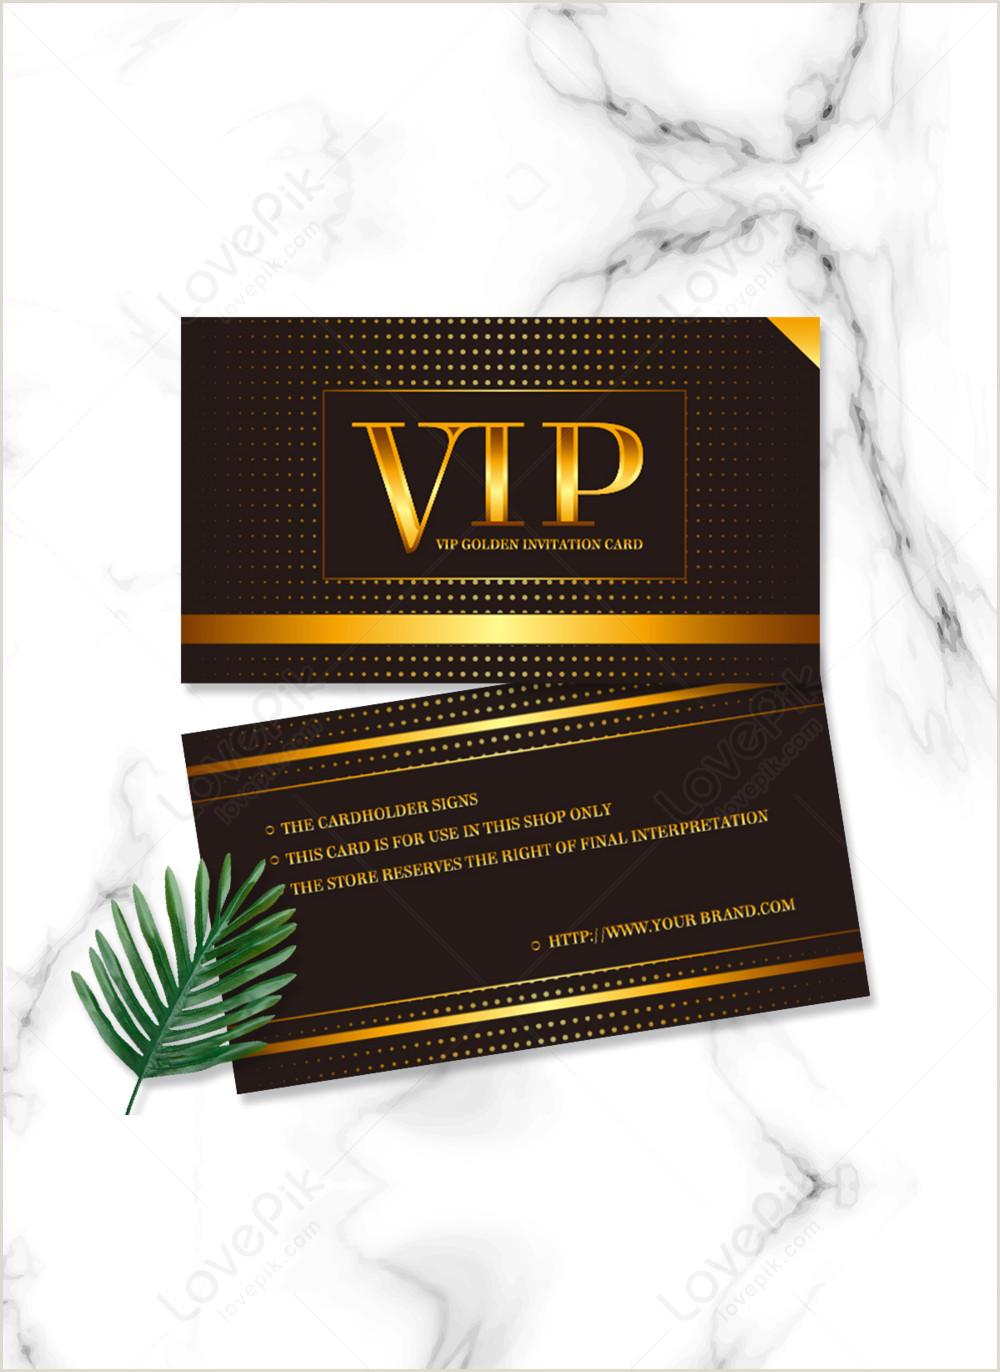 Complimentary Card Samples Membership Card High End Vip Card Discount Card Template